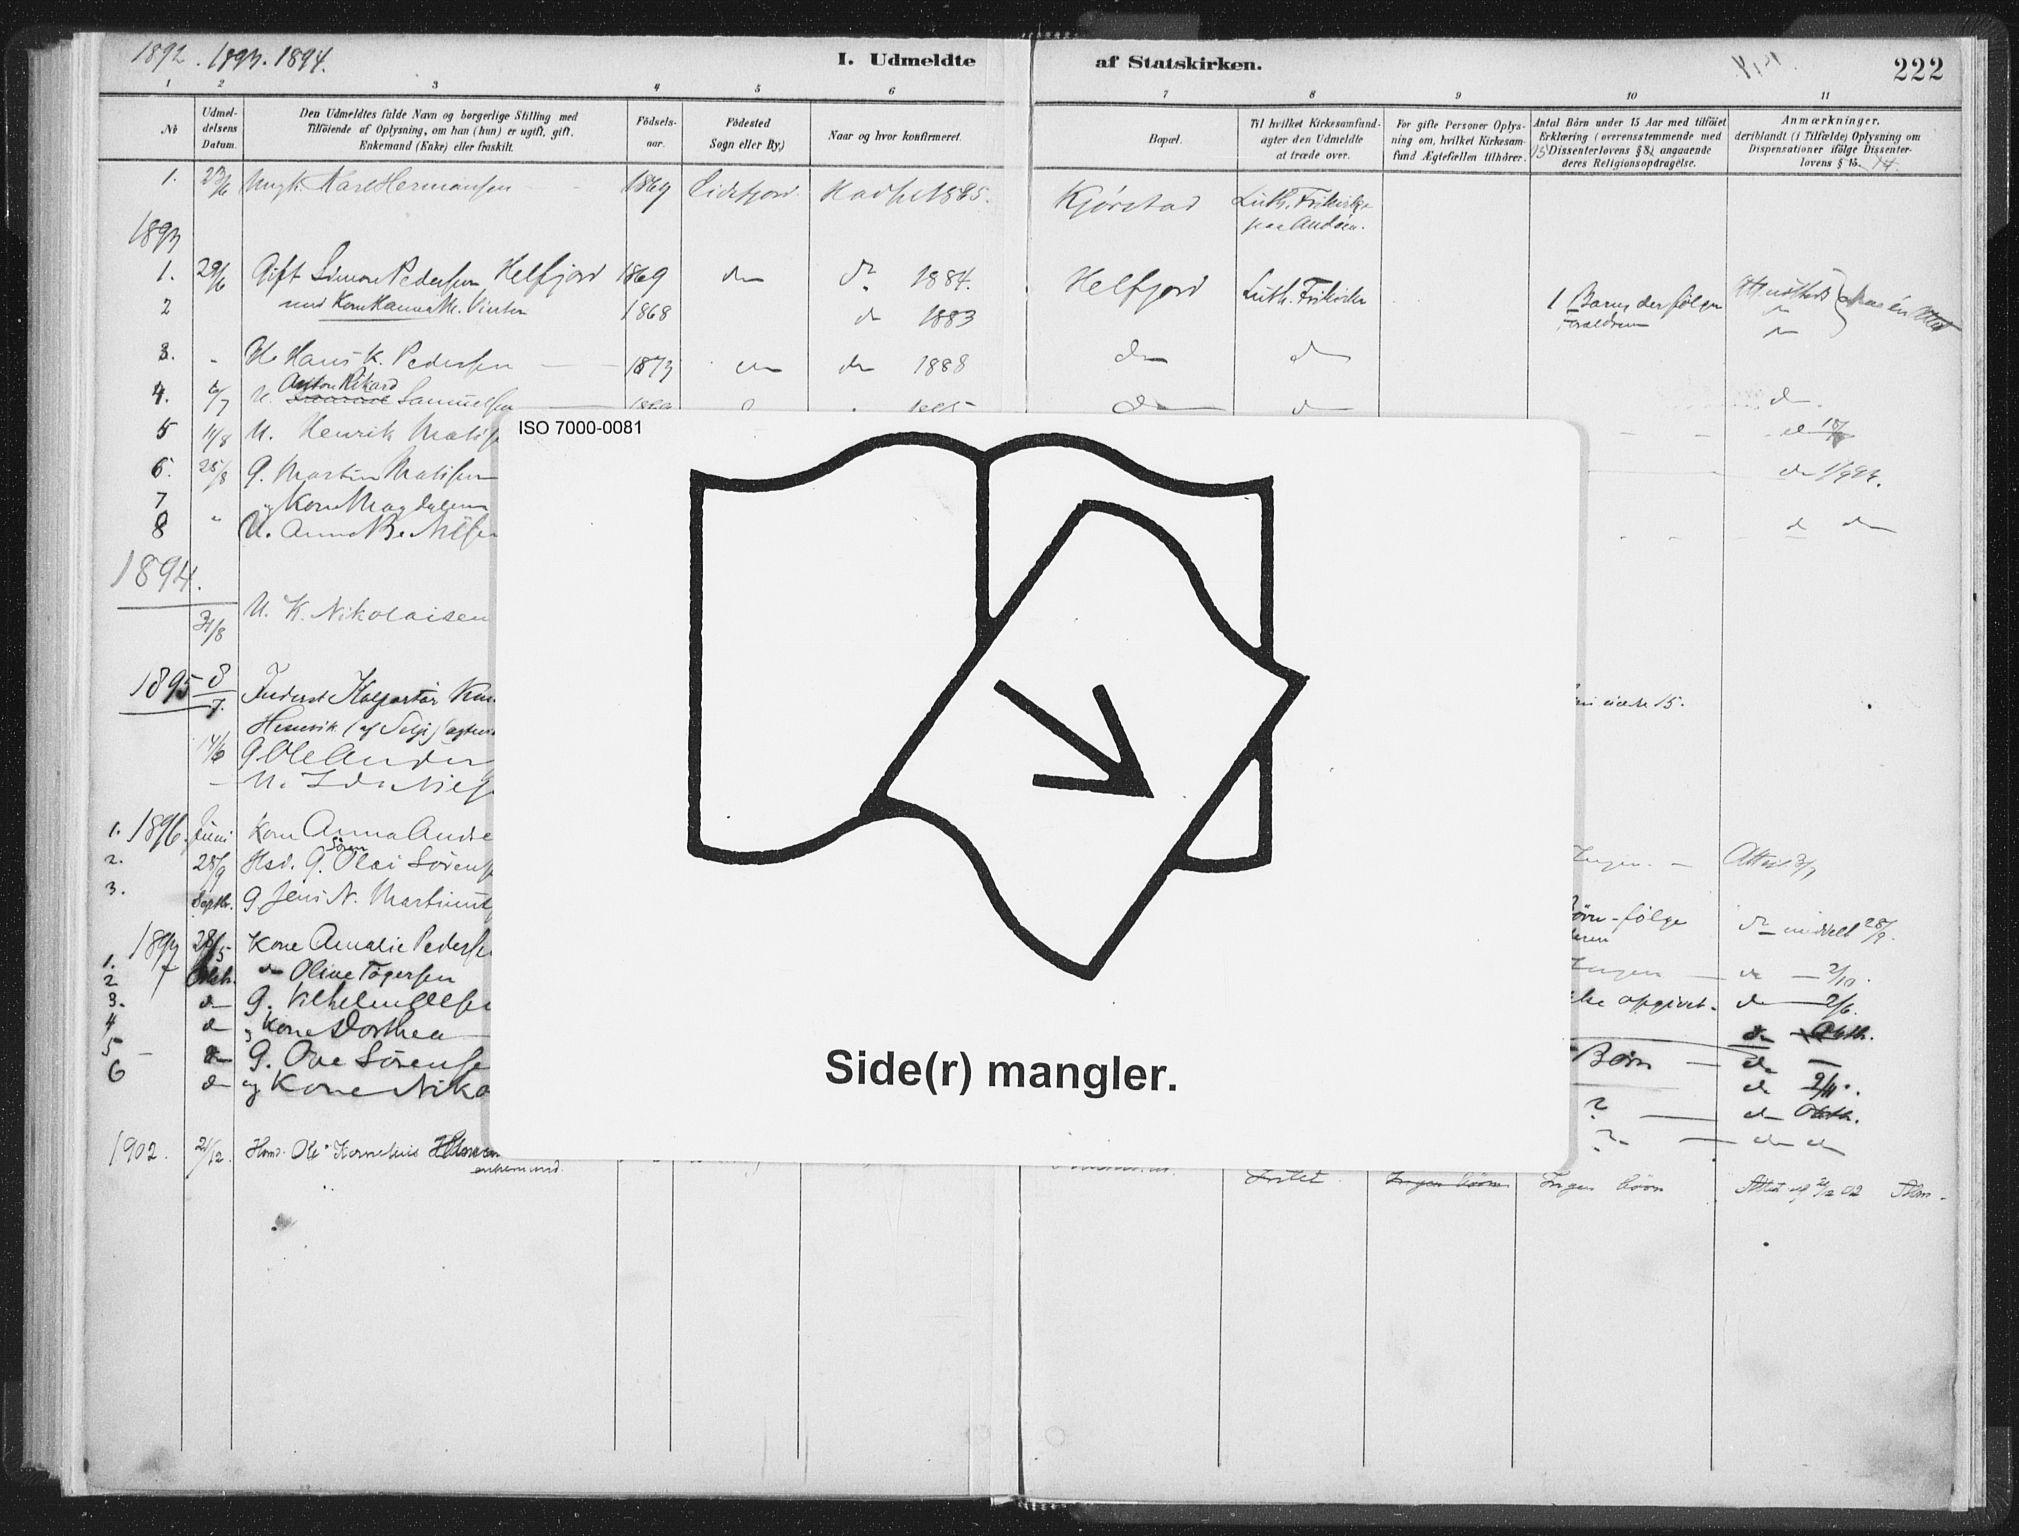 SAT, Ministerialprotokoller, klokkerbøker og fødselsregistre - Nordland, 890/L1286: Ministerialbok nr. 890A01, 1882-1902, s. 222